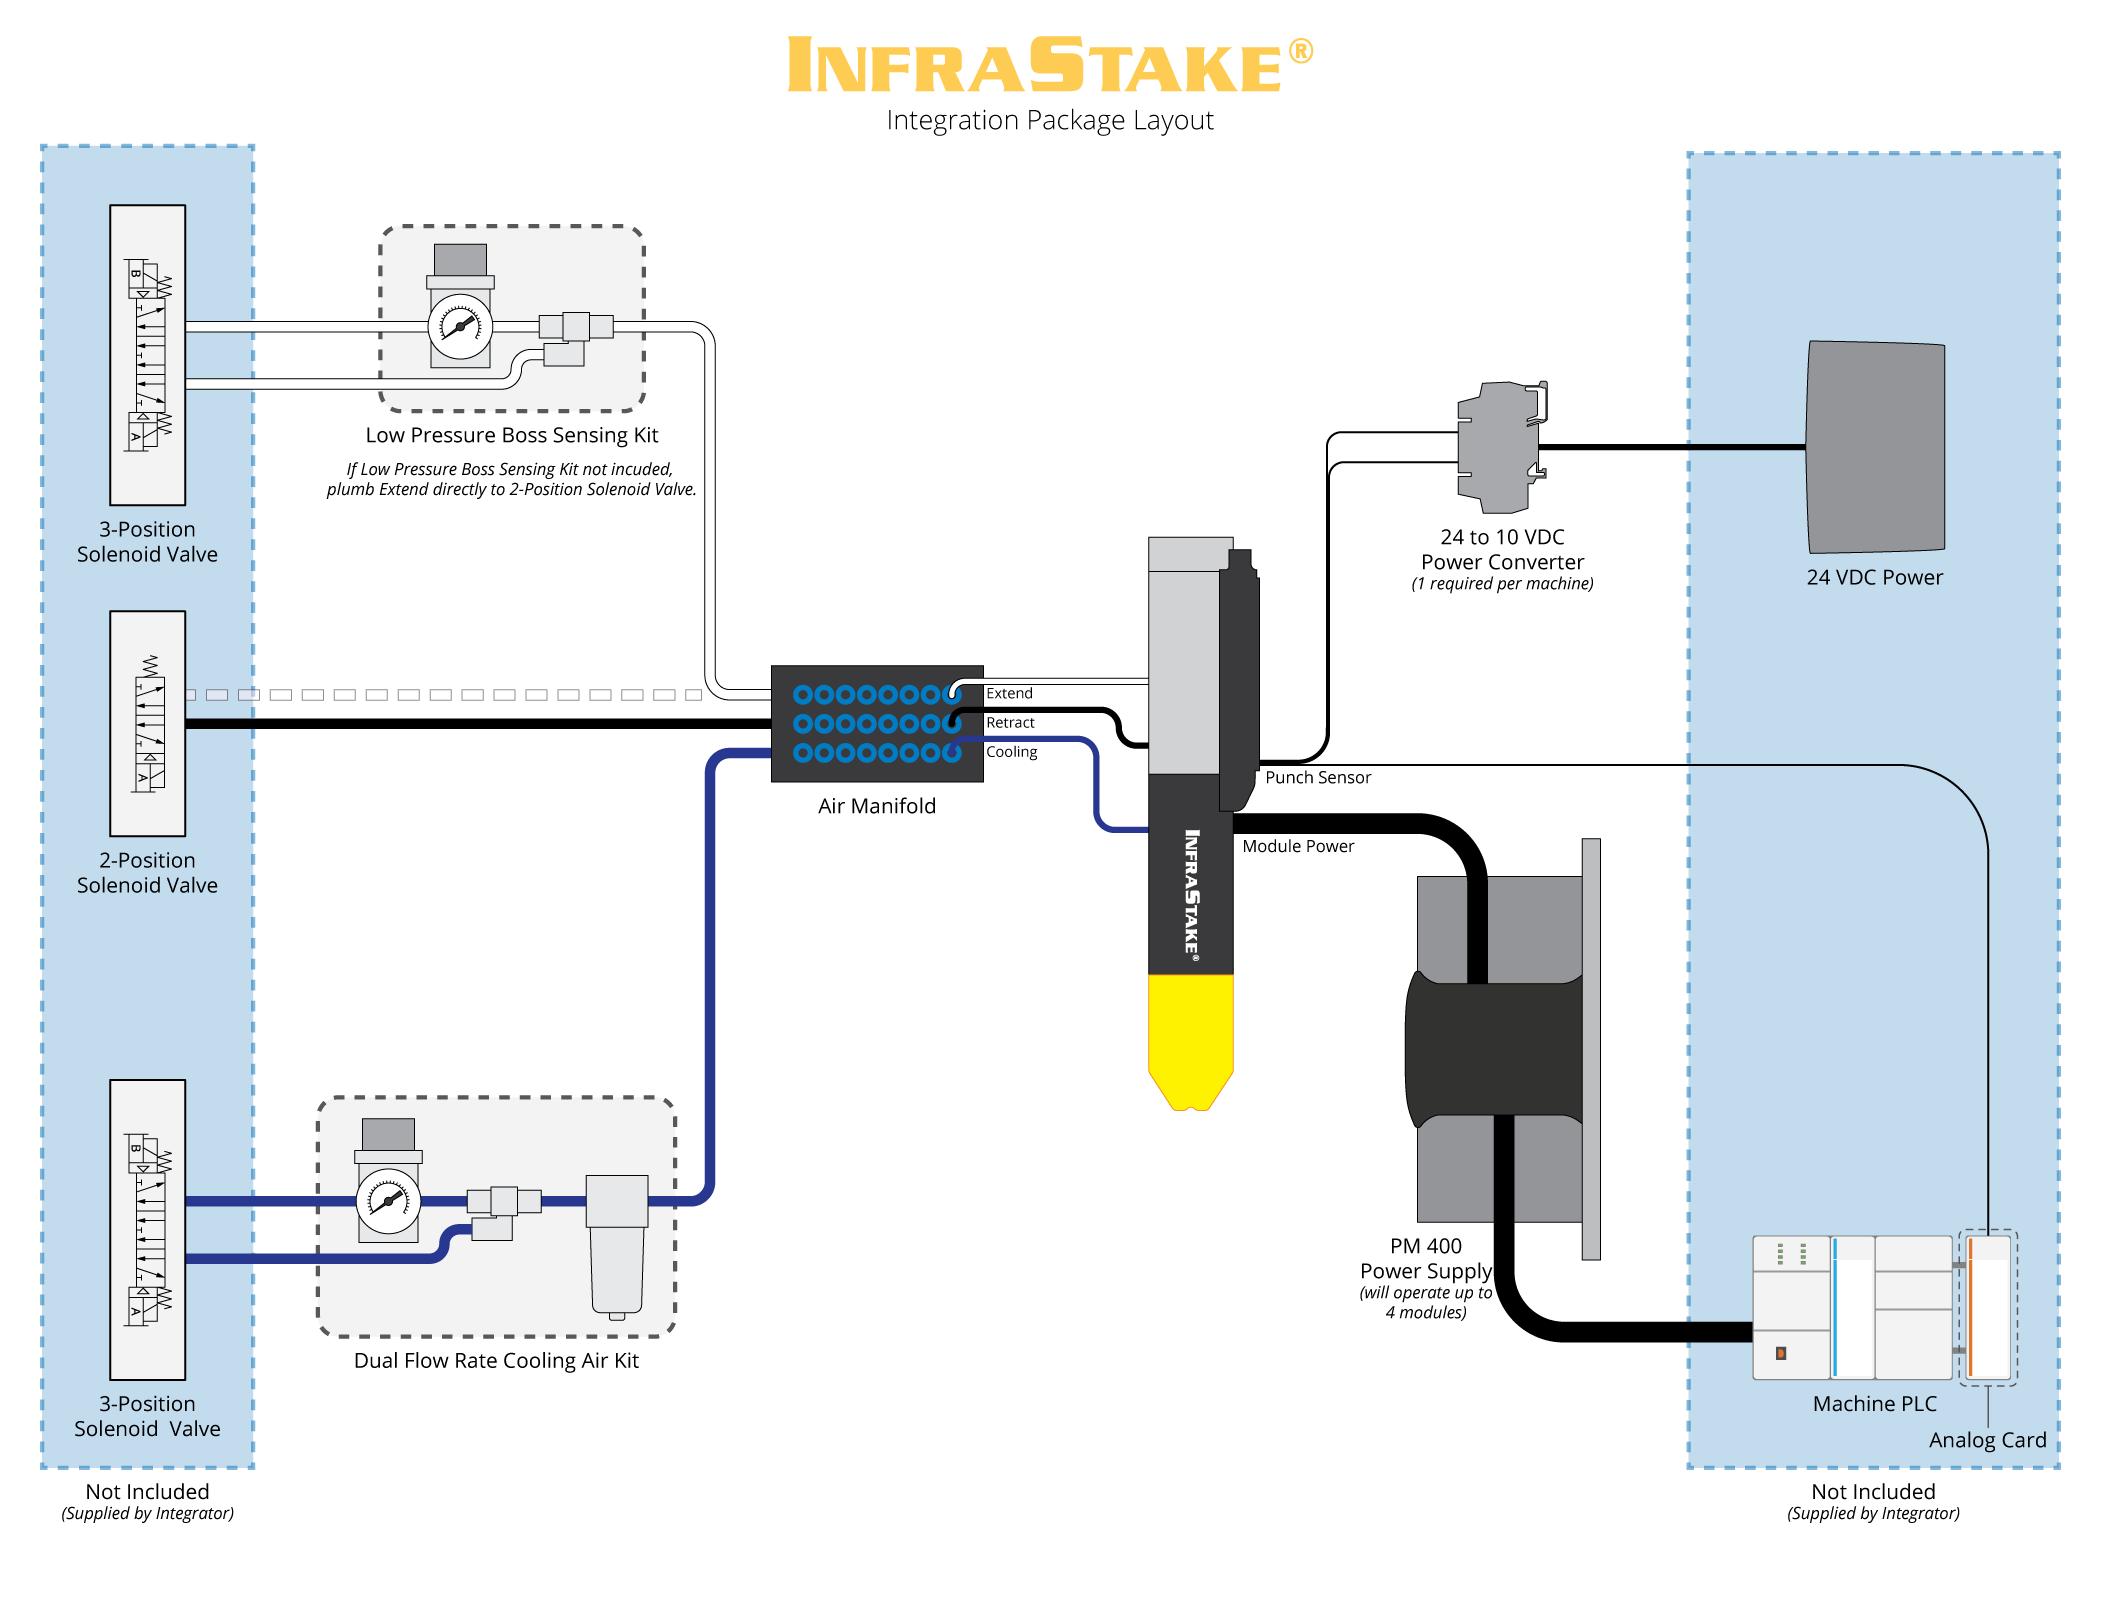 Download InfraStake Integration Package Layout